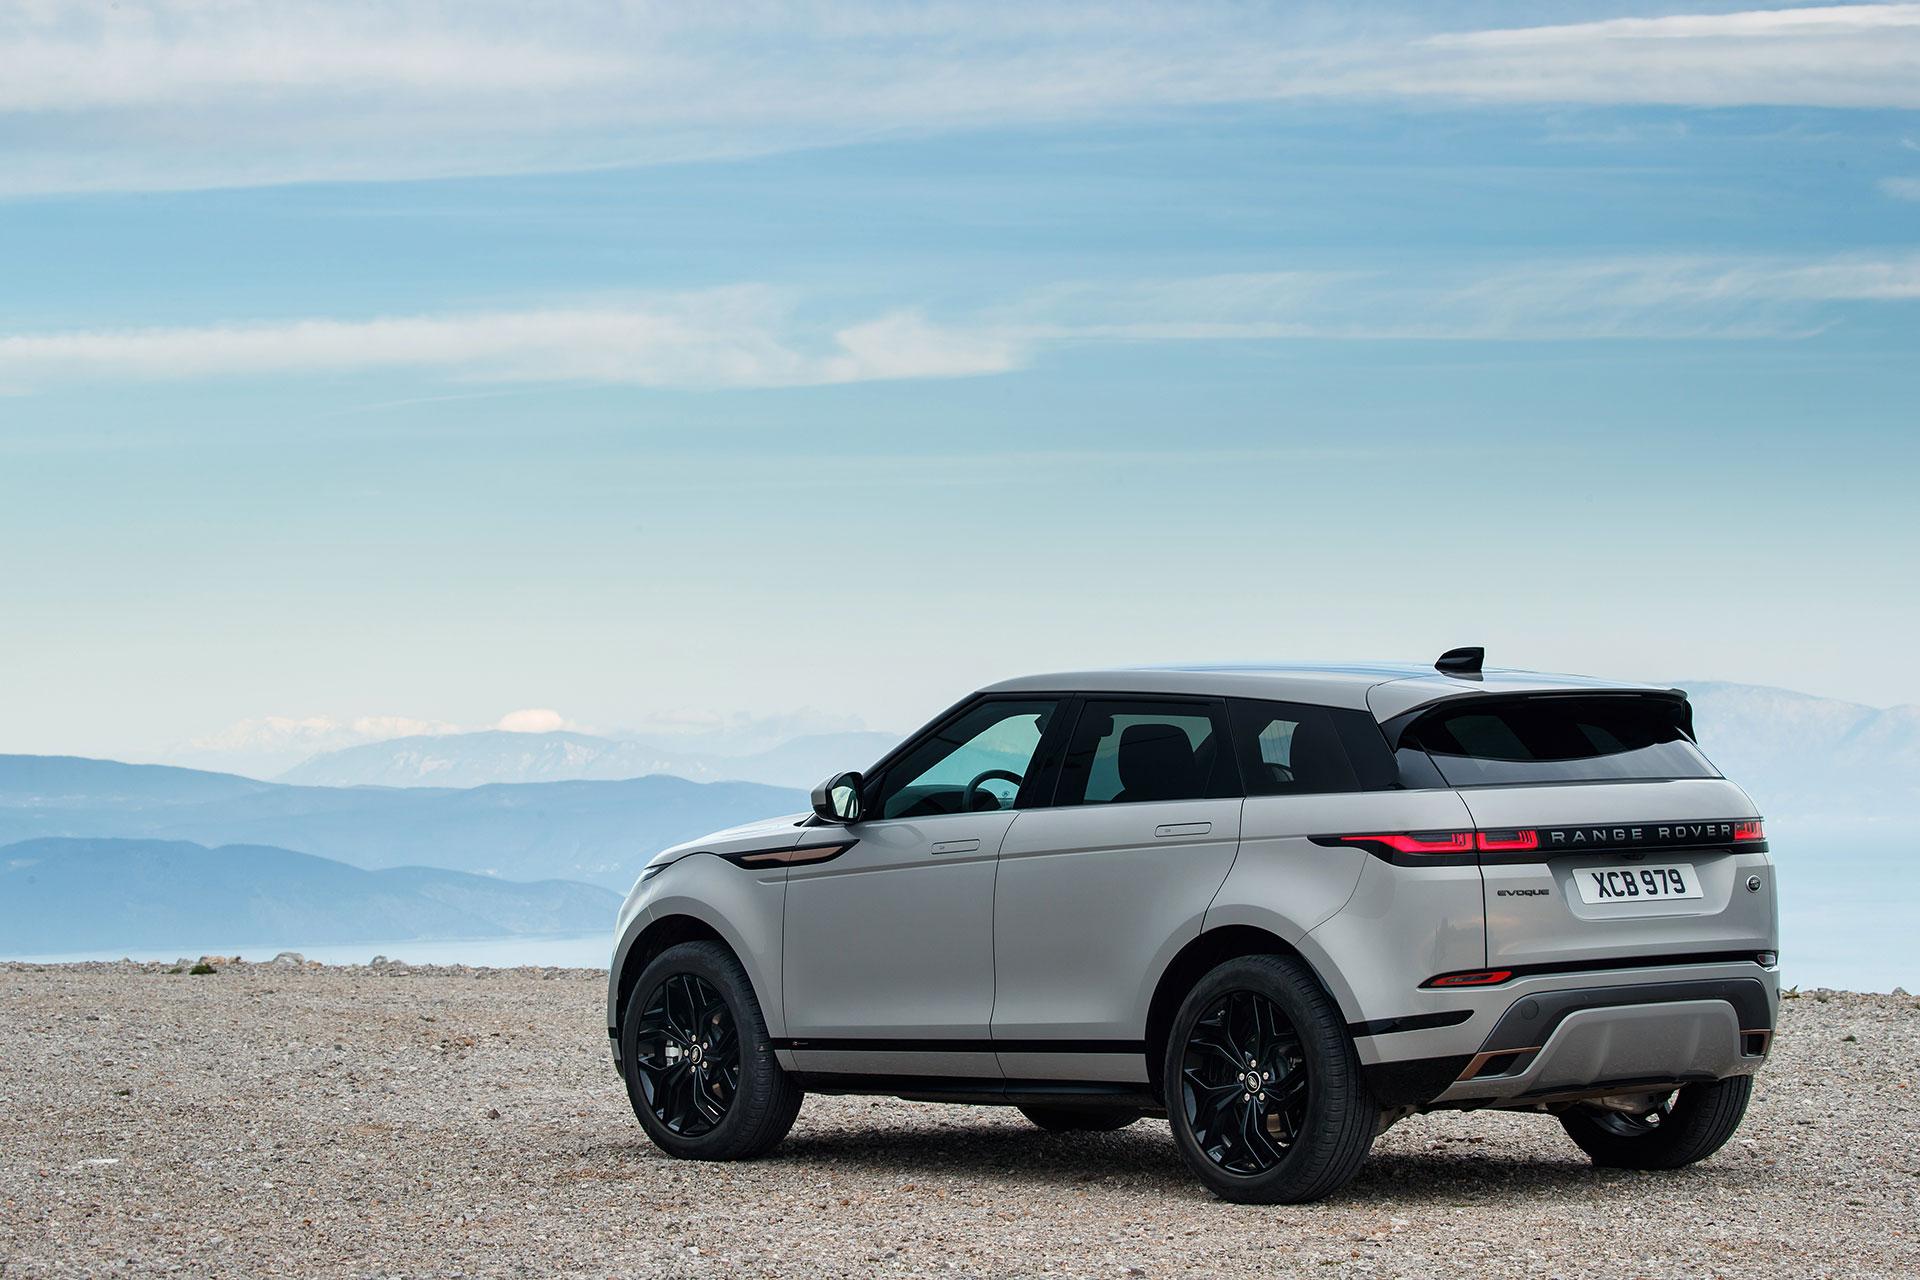 Range Rover Evoque 2019 Gris Exterior 19